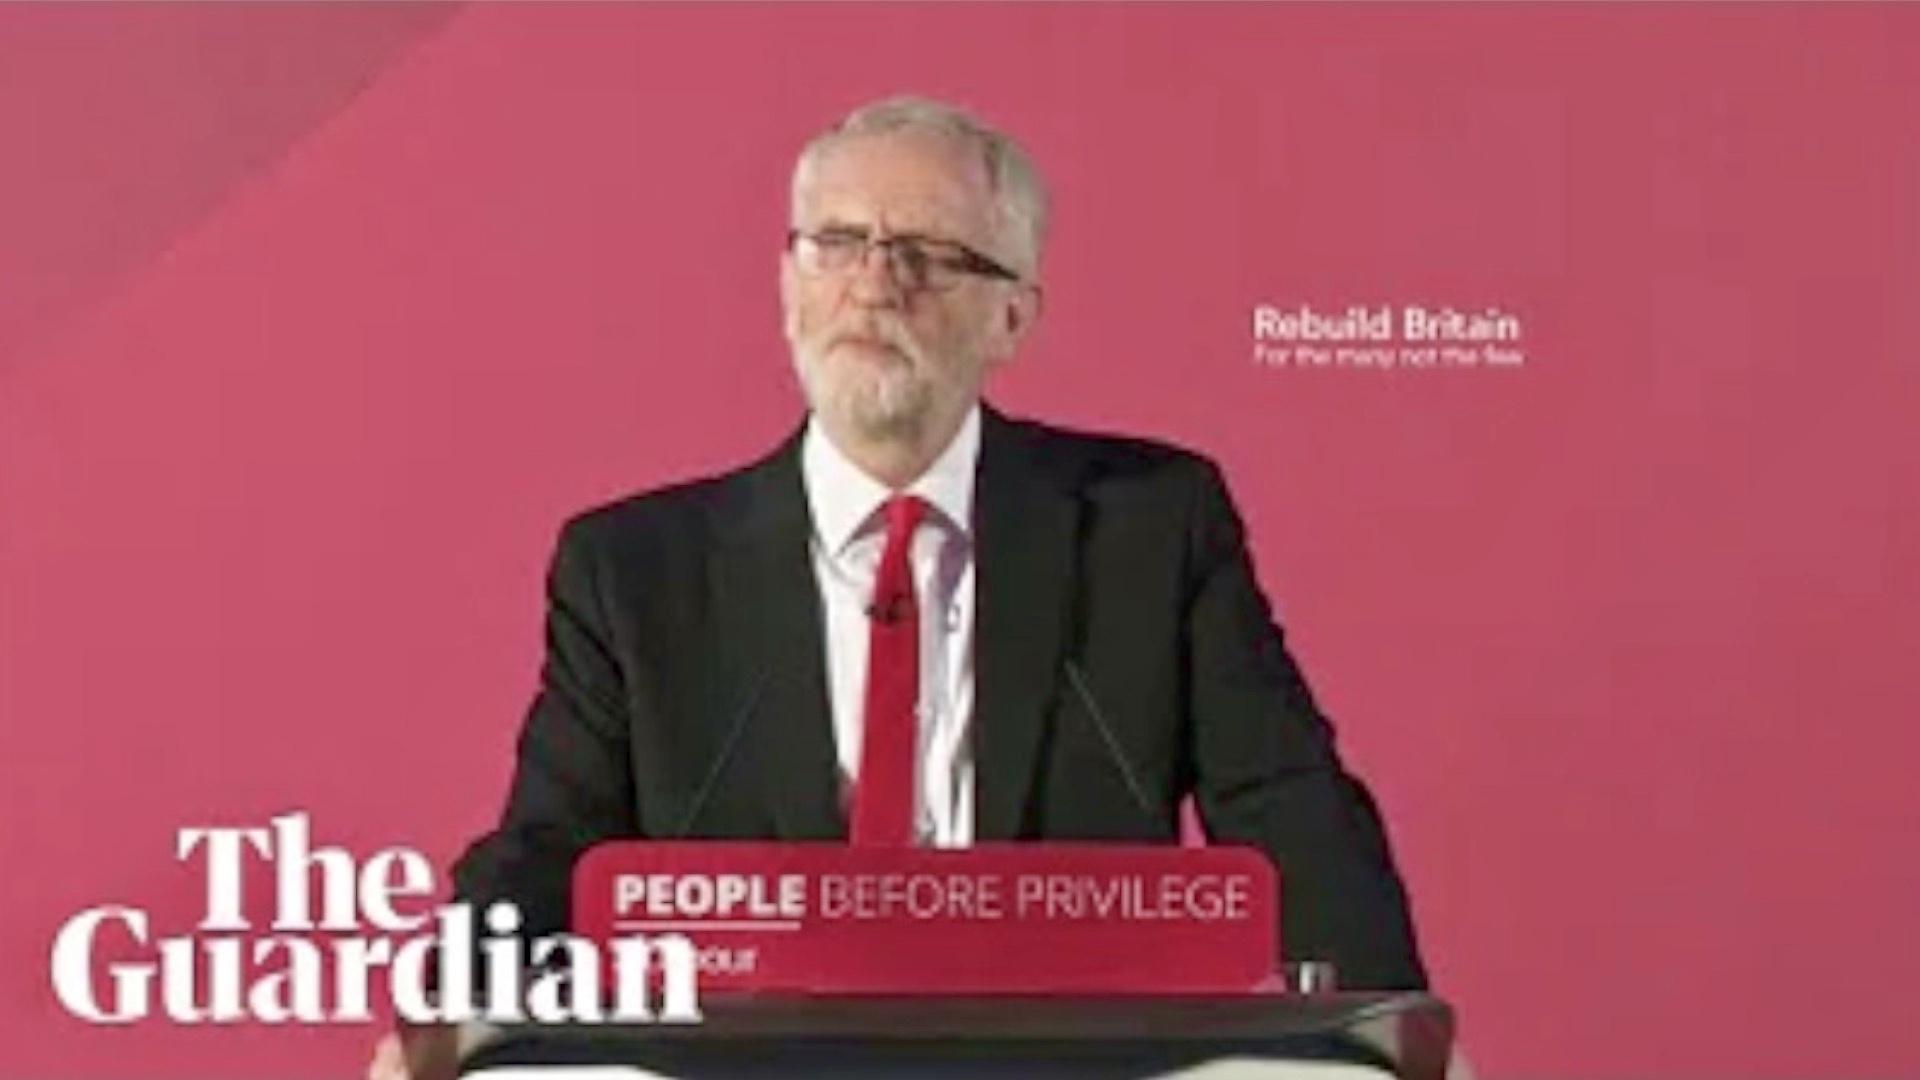 Jeremy Corbyn Speaks of Labour's Plans - LIVE